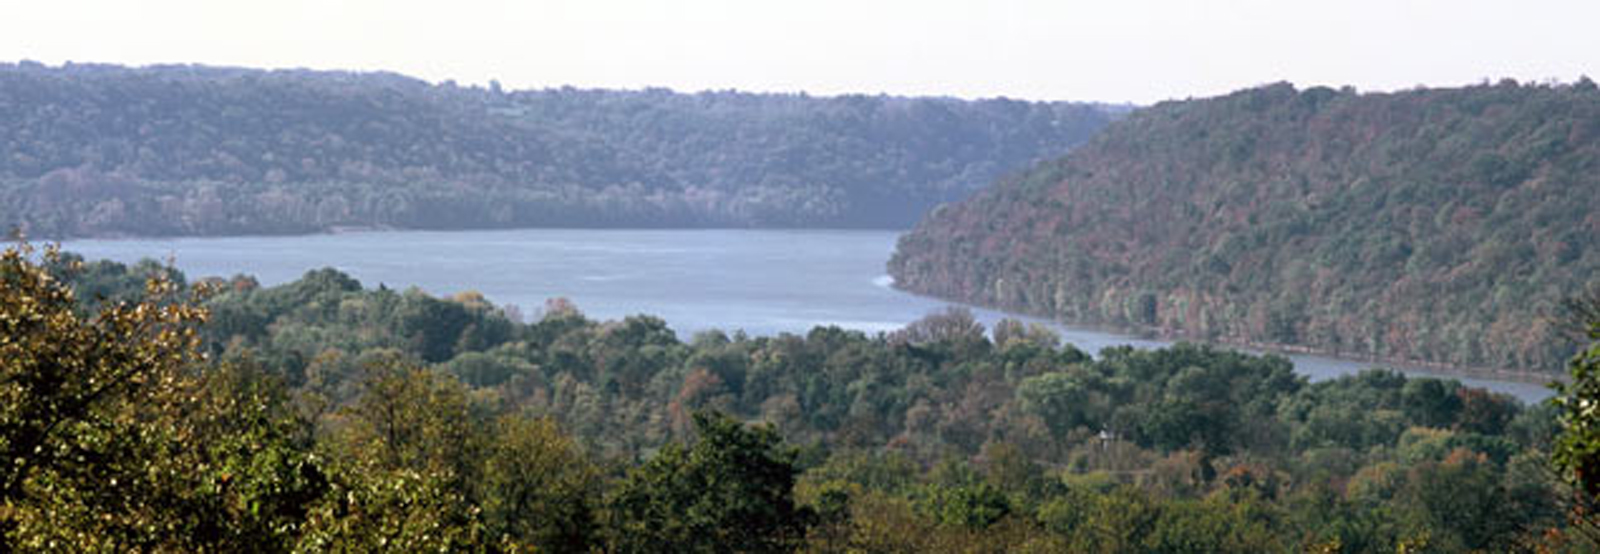 Ohio-River-Bend-James-Archambeault-banner-1600.jpg